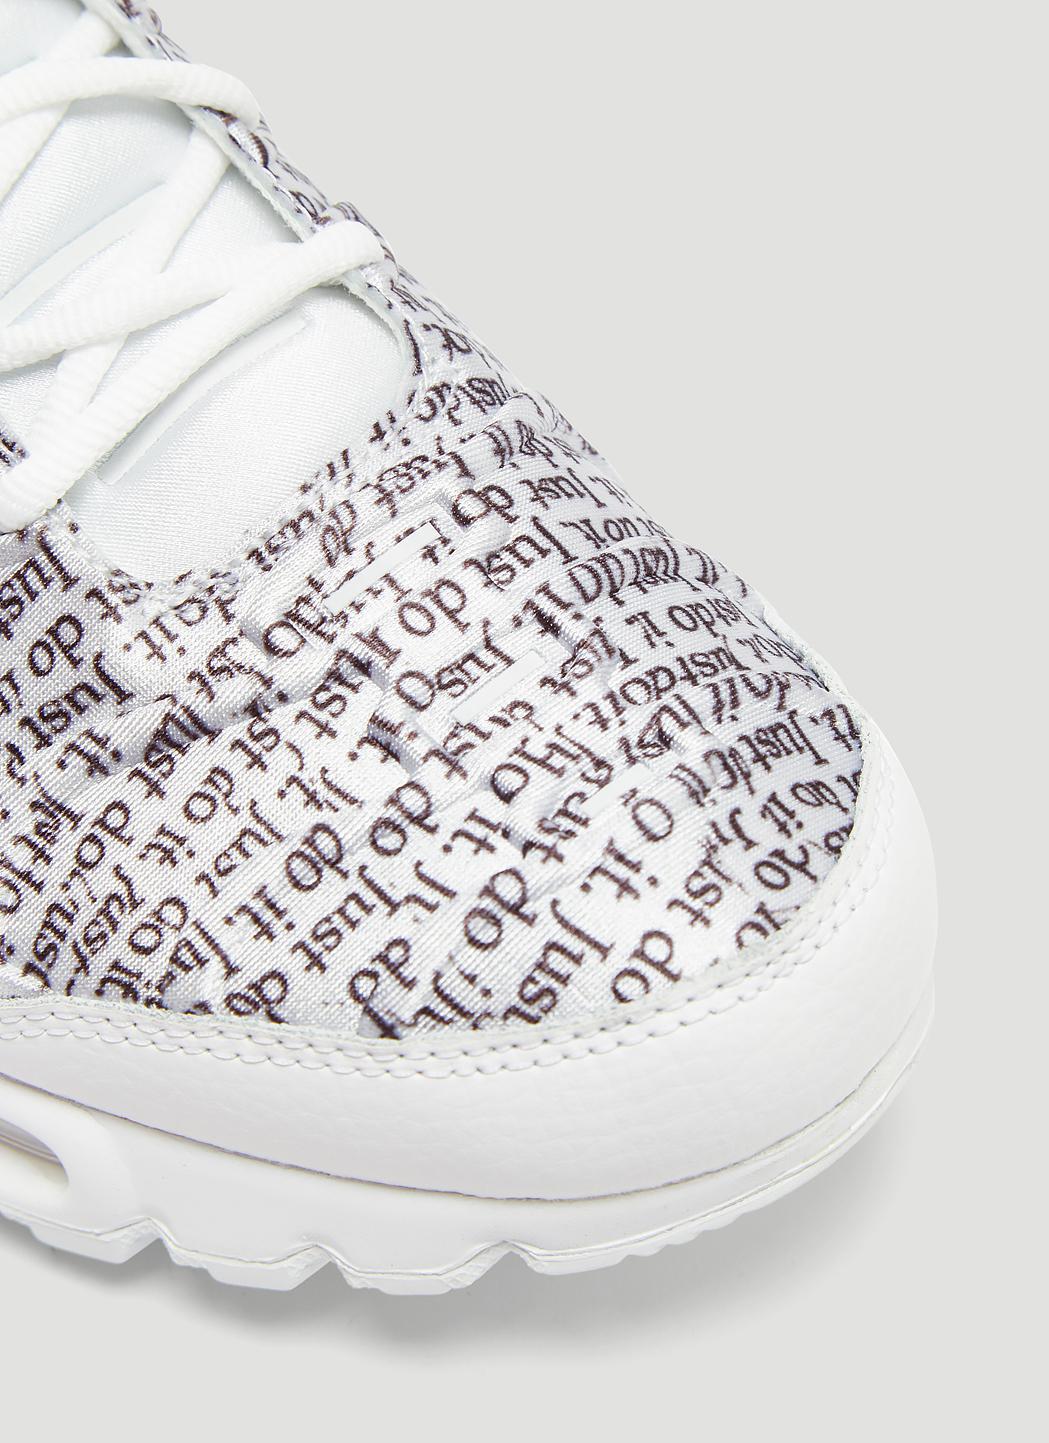 e77c3c32e3c3 Lyst - Nike Just Do It Tn Air Max Plus Se Sneakers In White in White